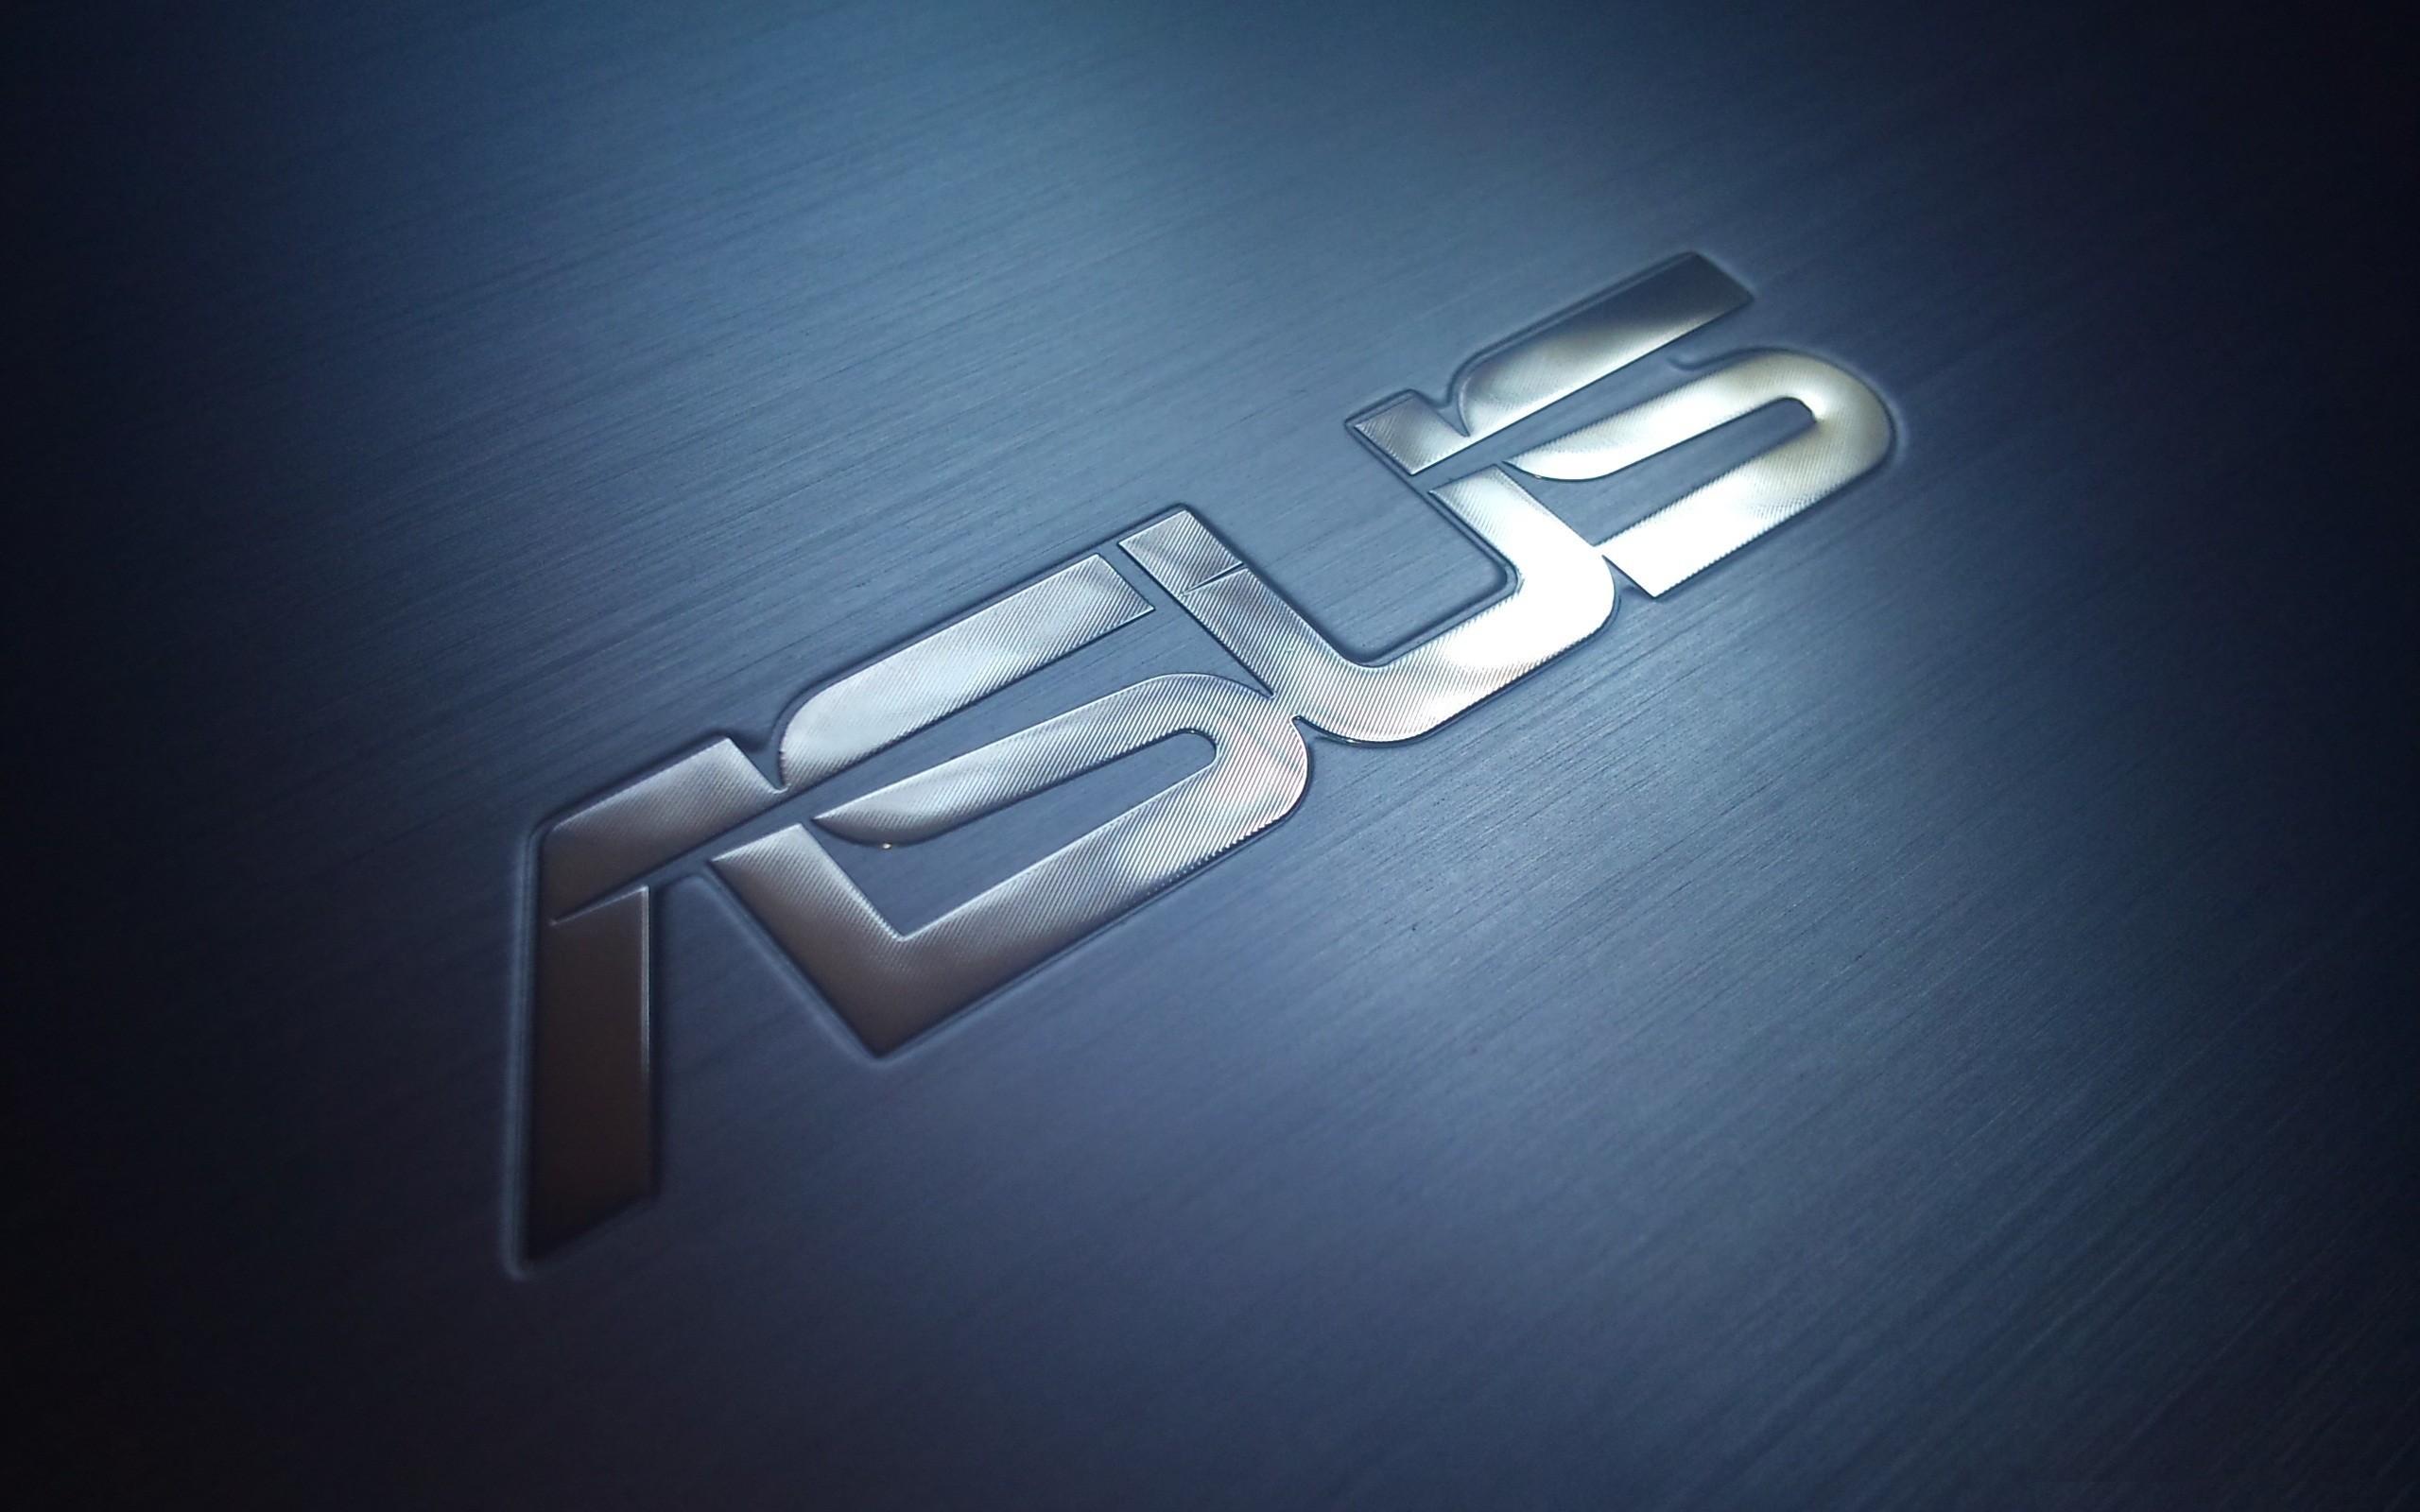 Asus, HD Logo, 4k Wallpapers, Images